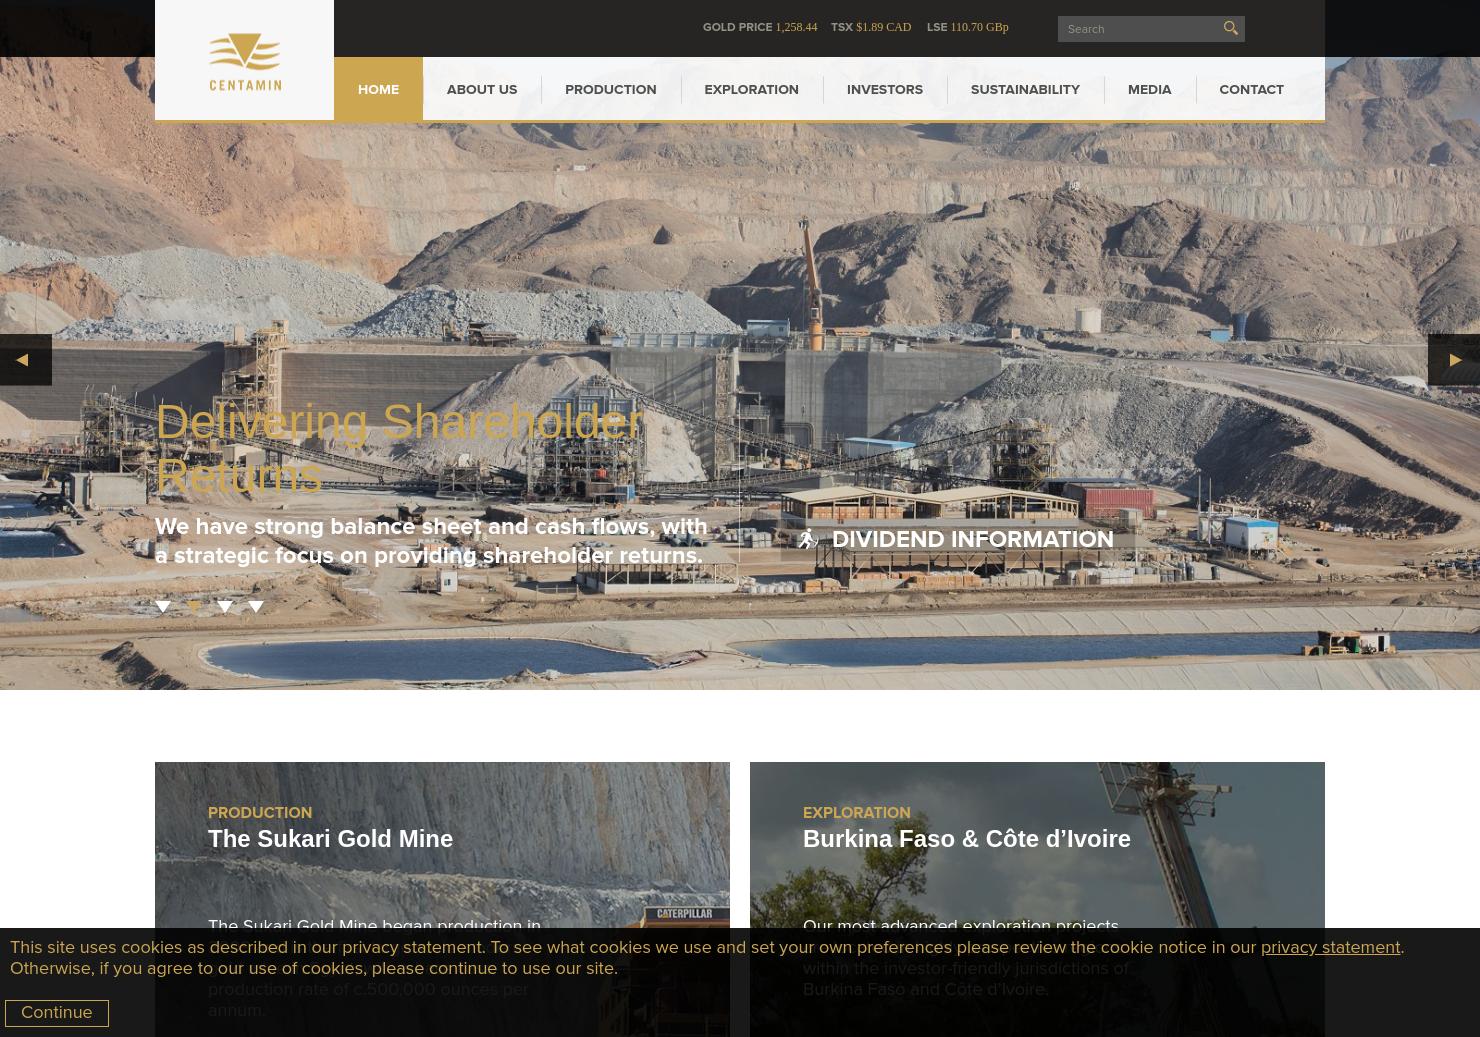 Centamin PLC Home Page